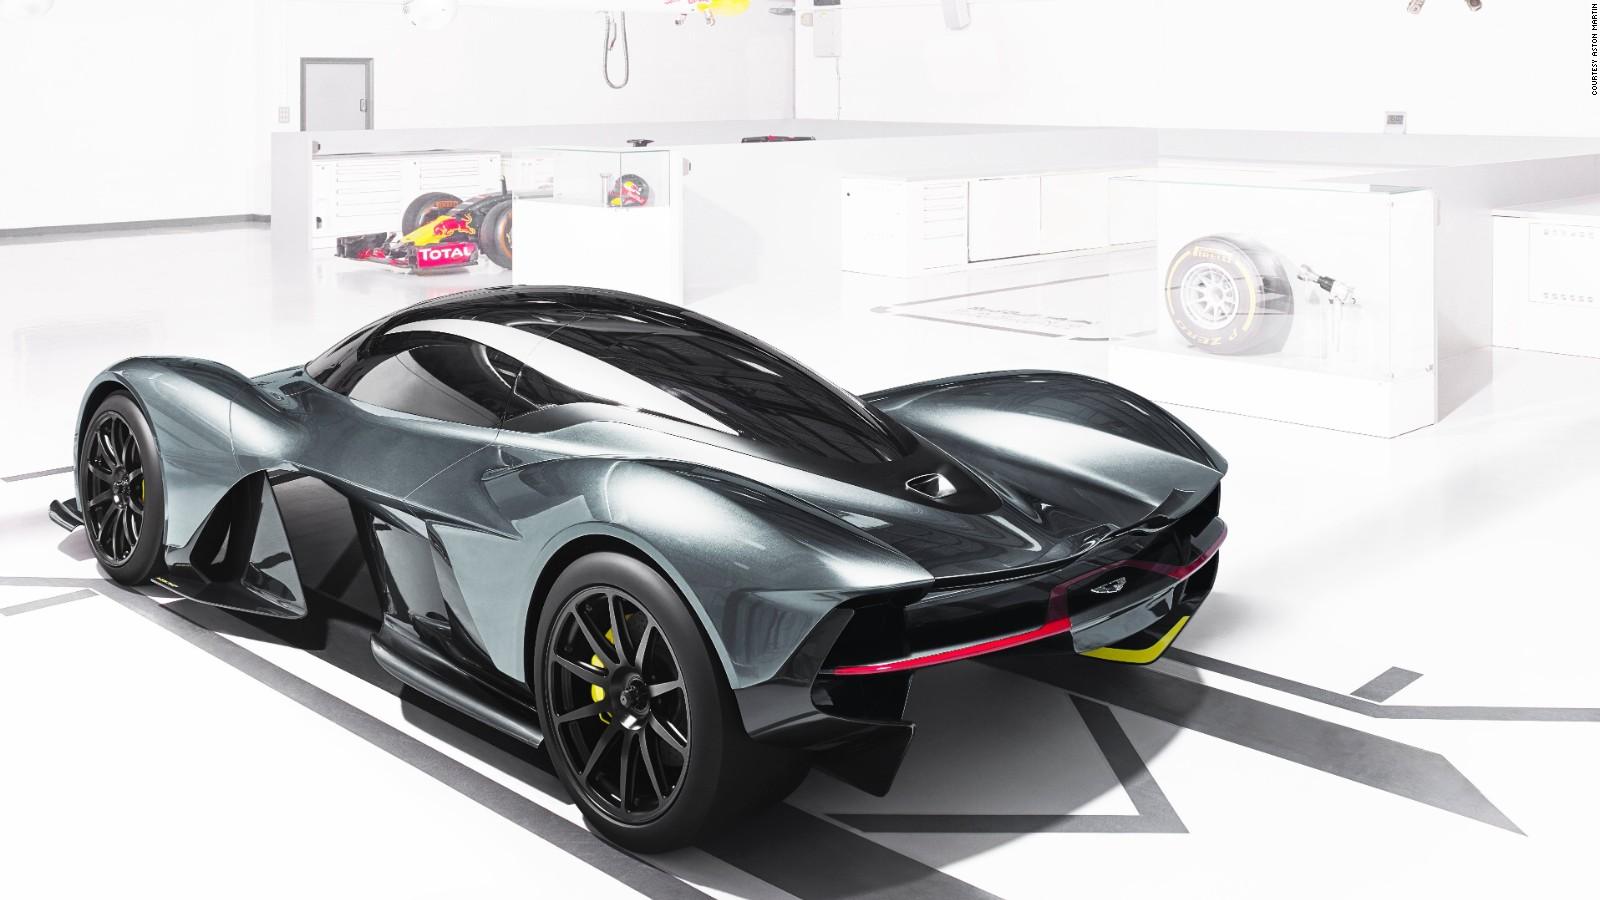 aston martin & red bull unveil new hypercar am-rb 001 - cnn style